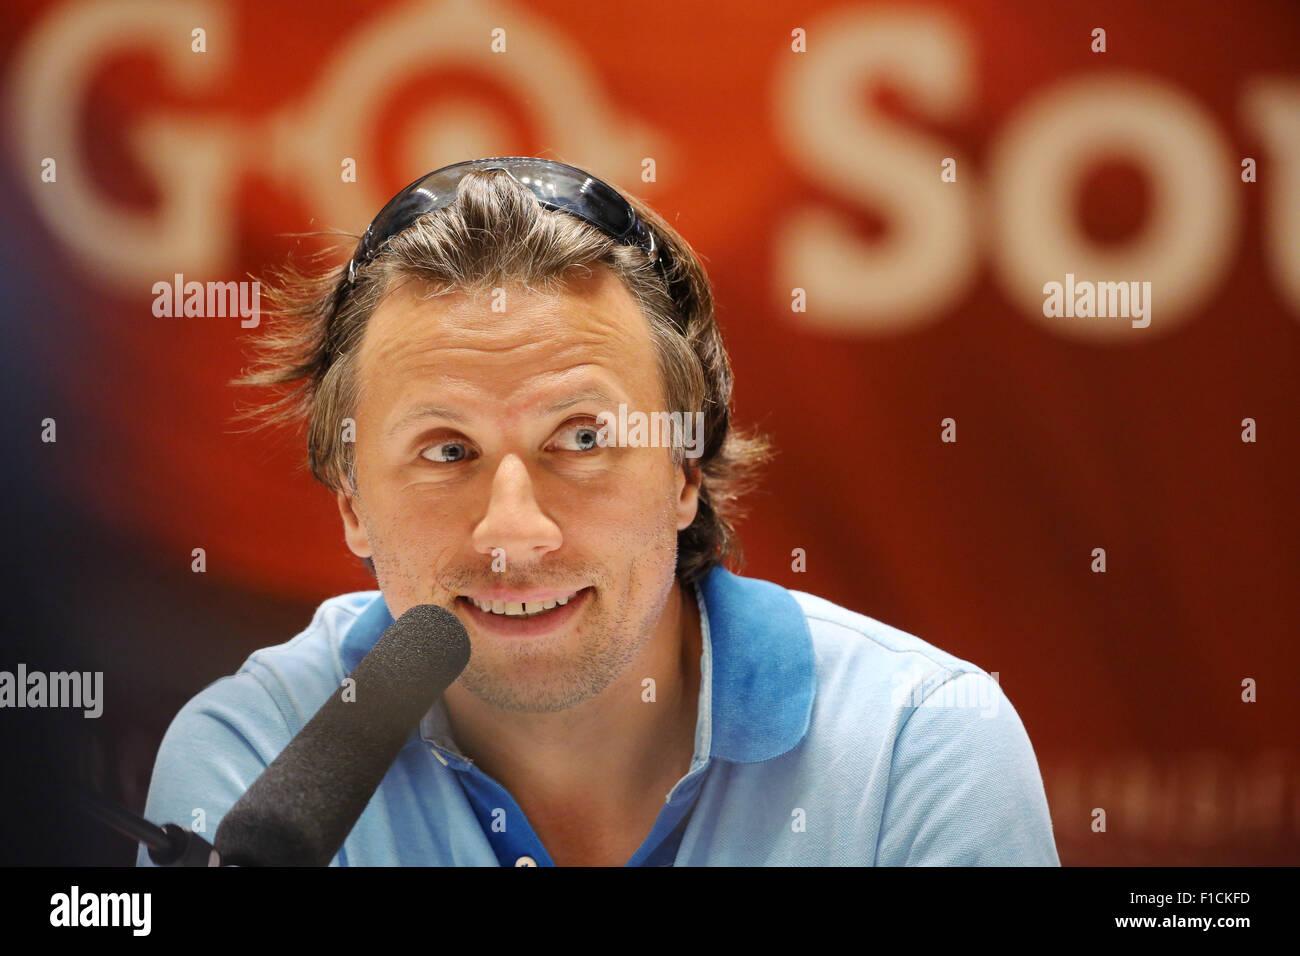 Leipzig, Germany. 1st Sep, 2015. MDR head conductor Kristjan Jaervi speaking at a press conference in Leipzig, Germany, - Stock Image